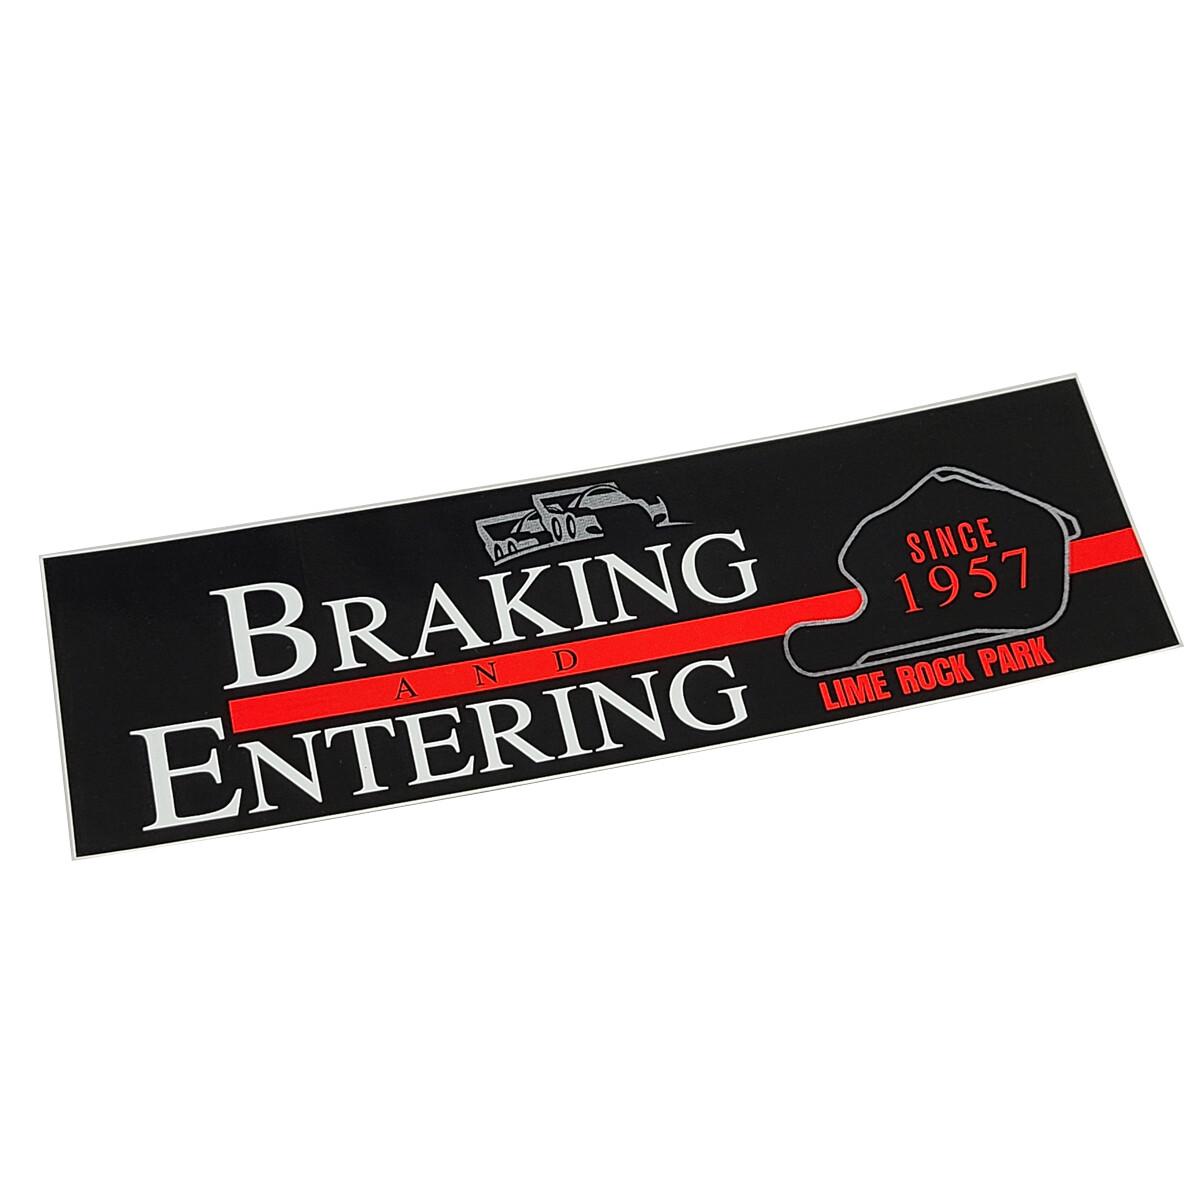 Braking and Entering Bumper Sticker